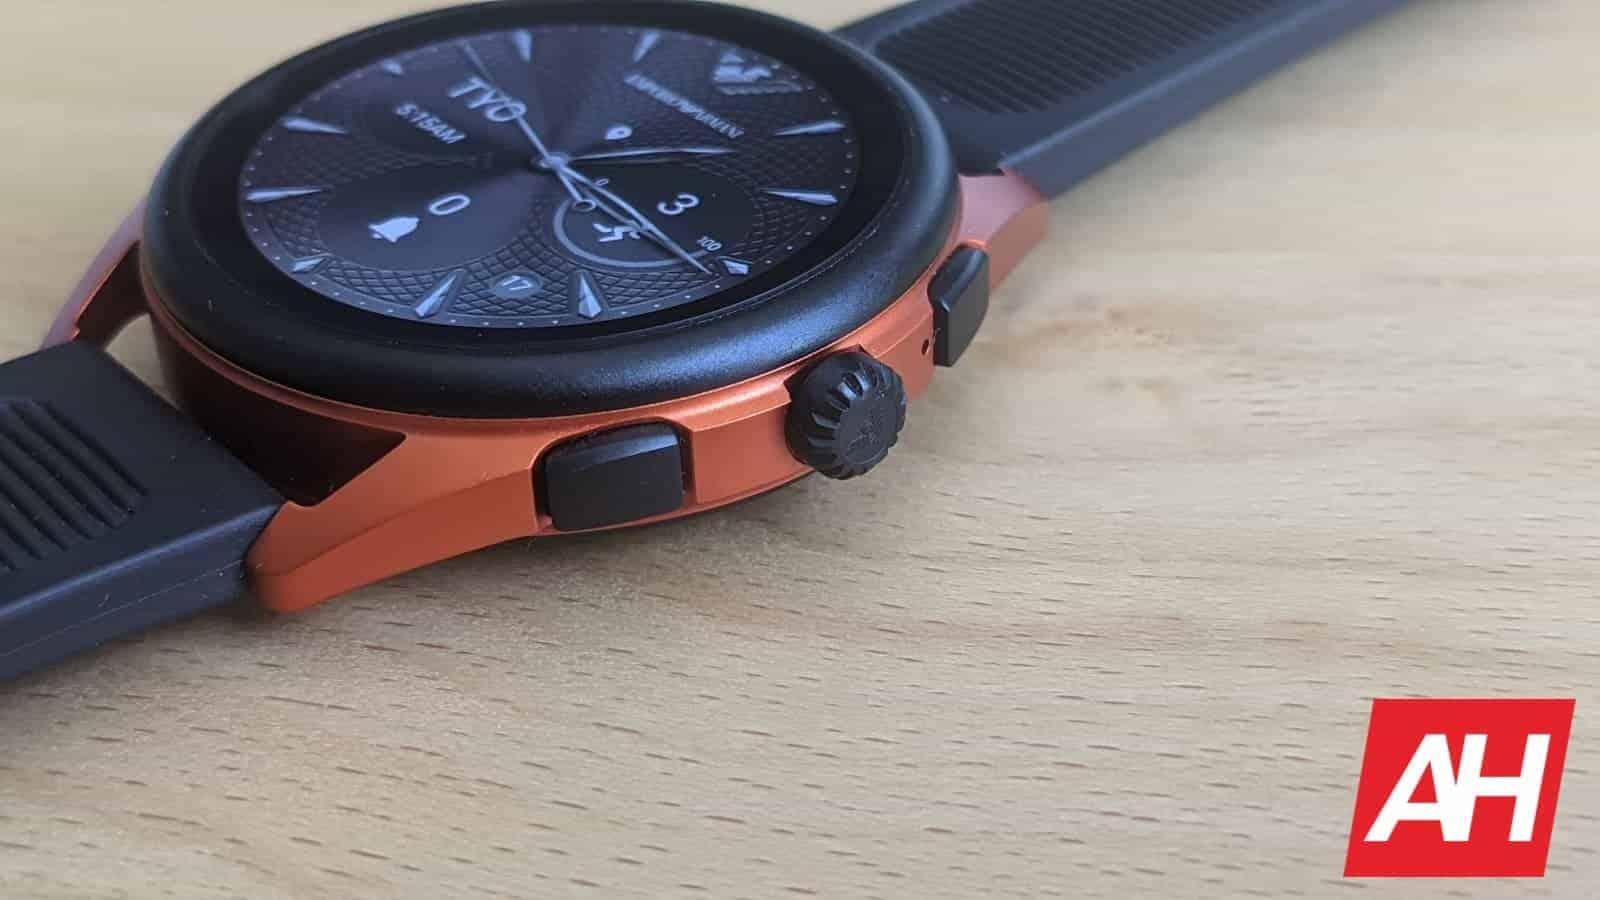 Emporio Armani Smartwatch 3 Review 8